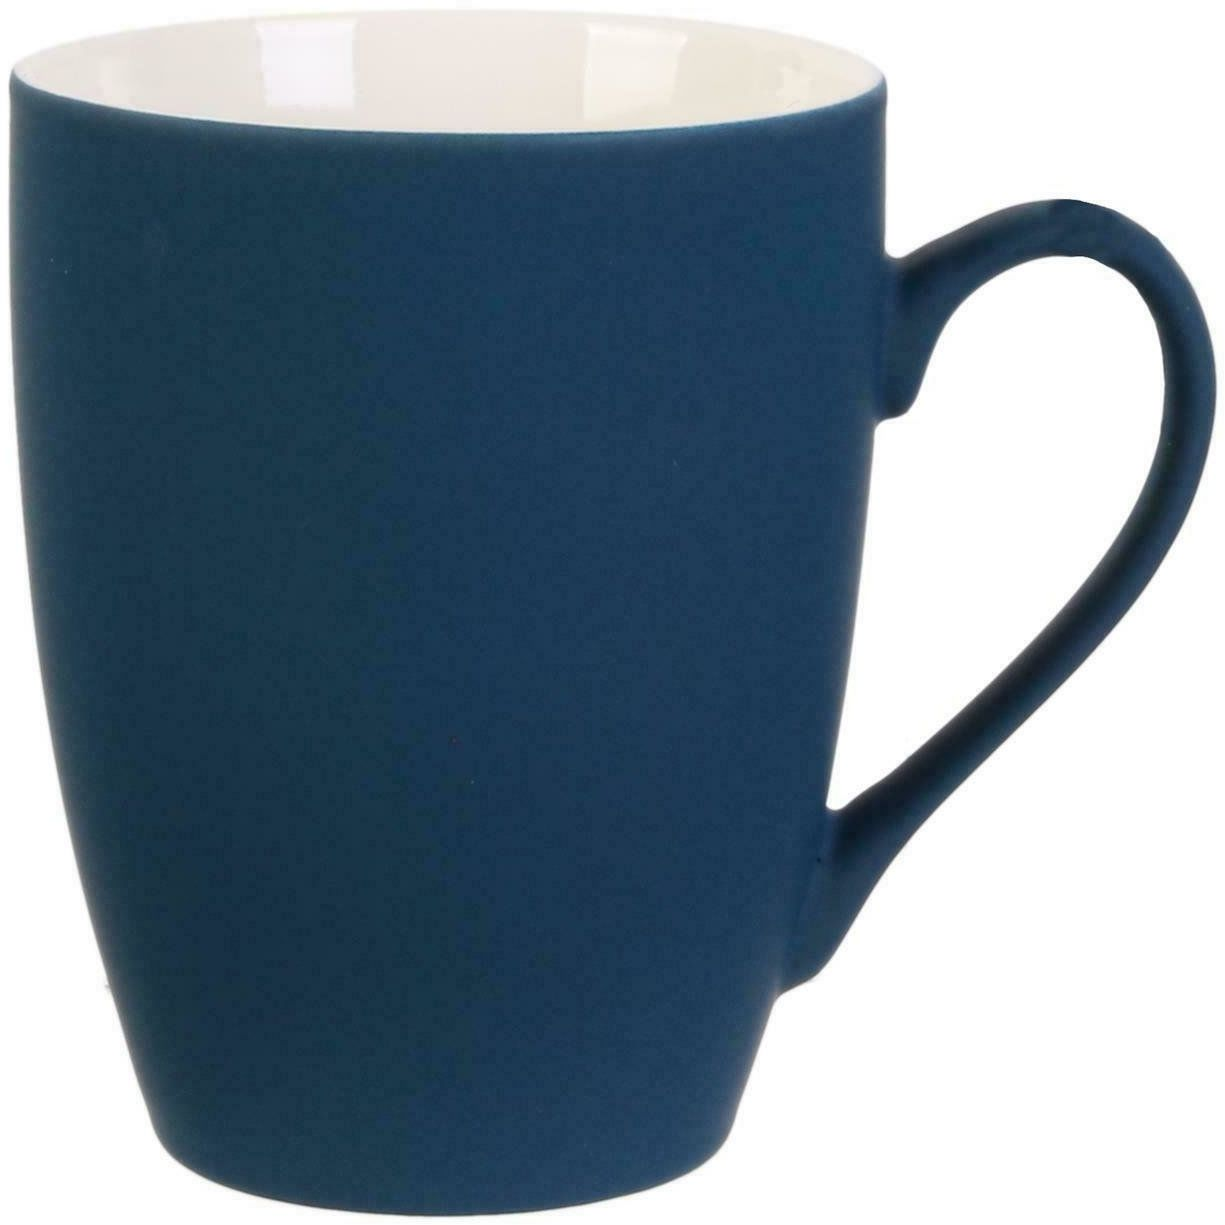 Kubek Suave niebieski 300ml